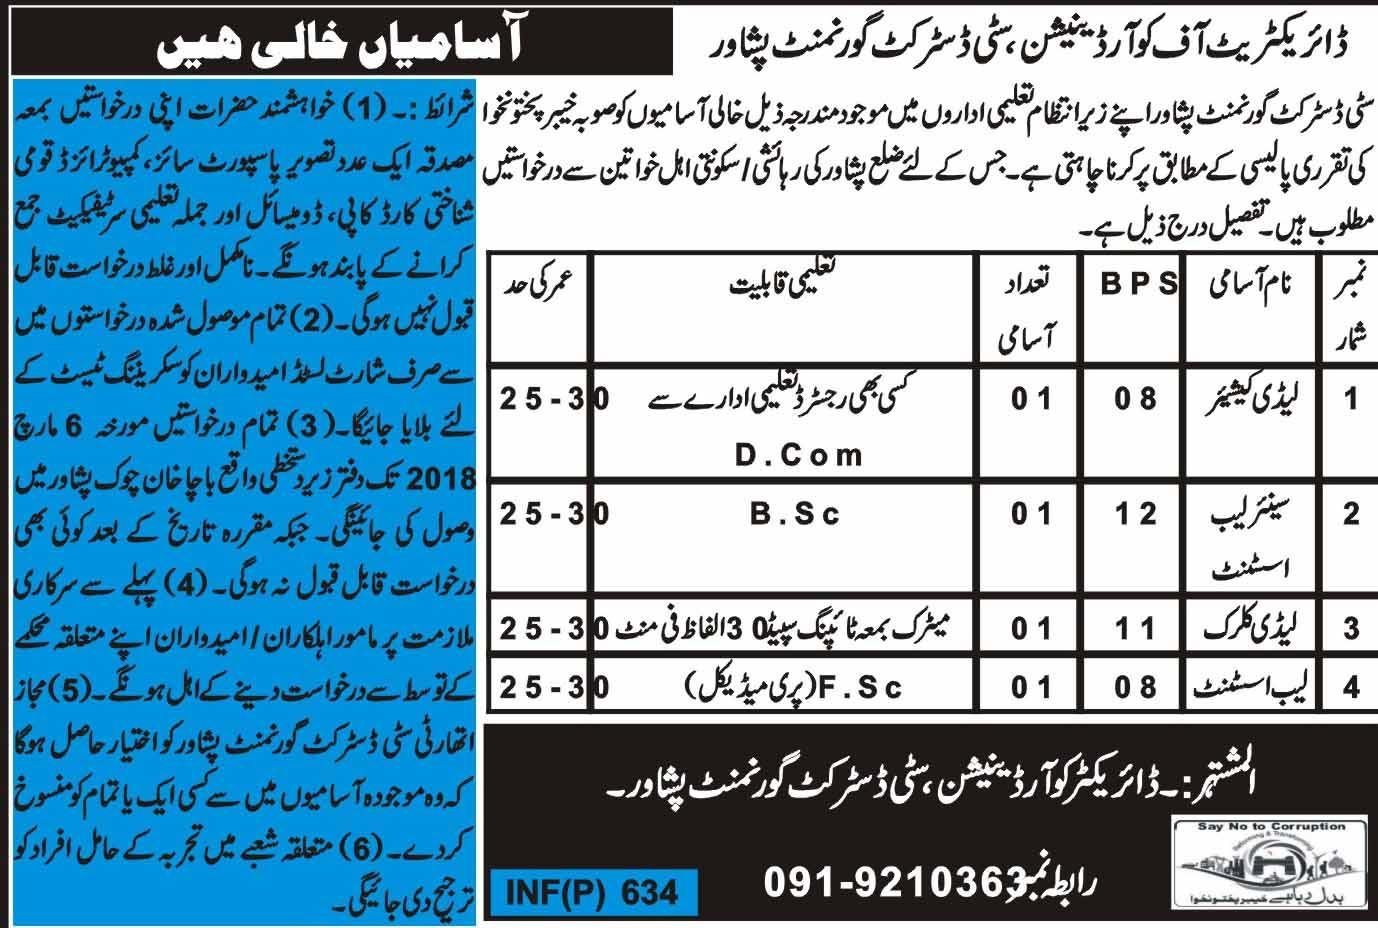 04 Jobs in City District Government Peshawar 06th February 2018 Daily Mashriq Newspaper